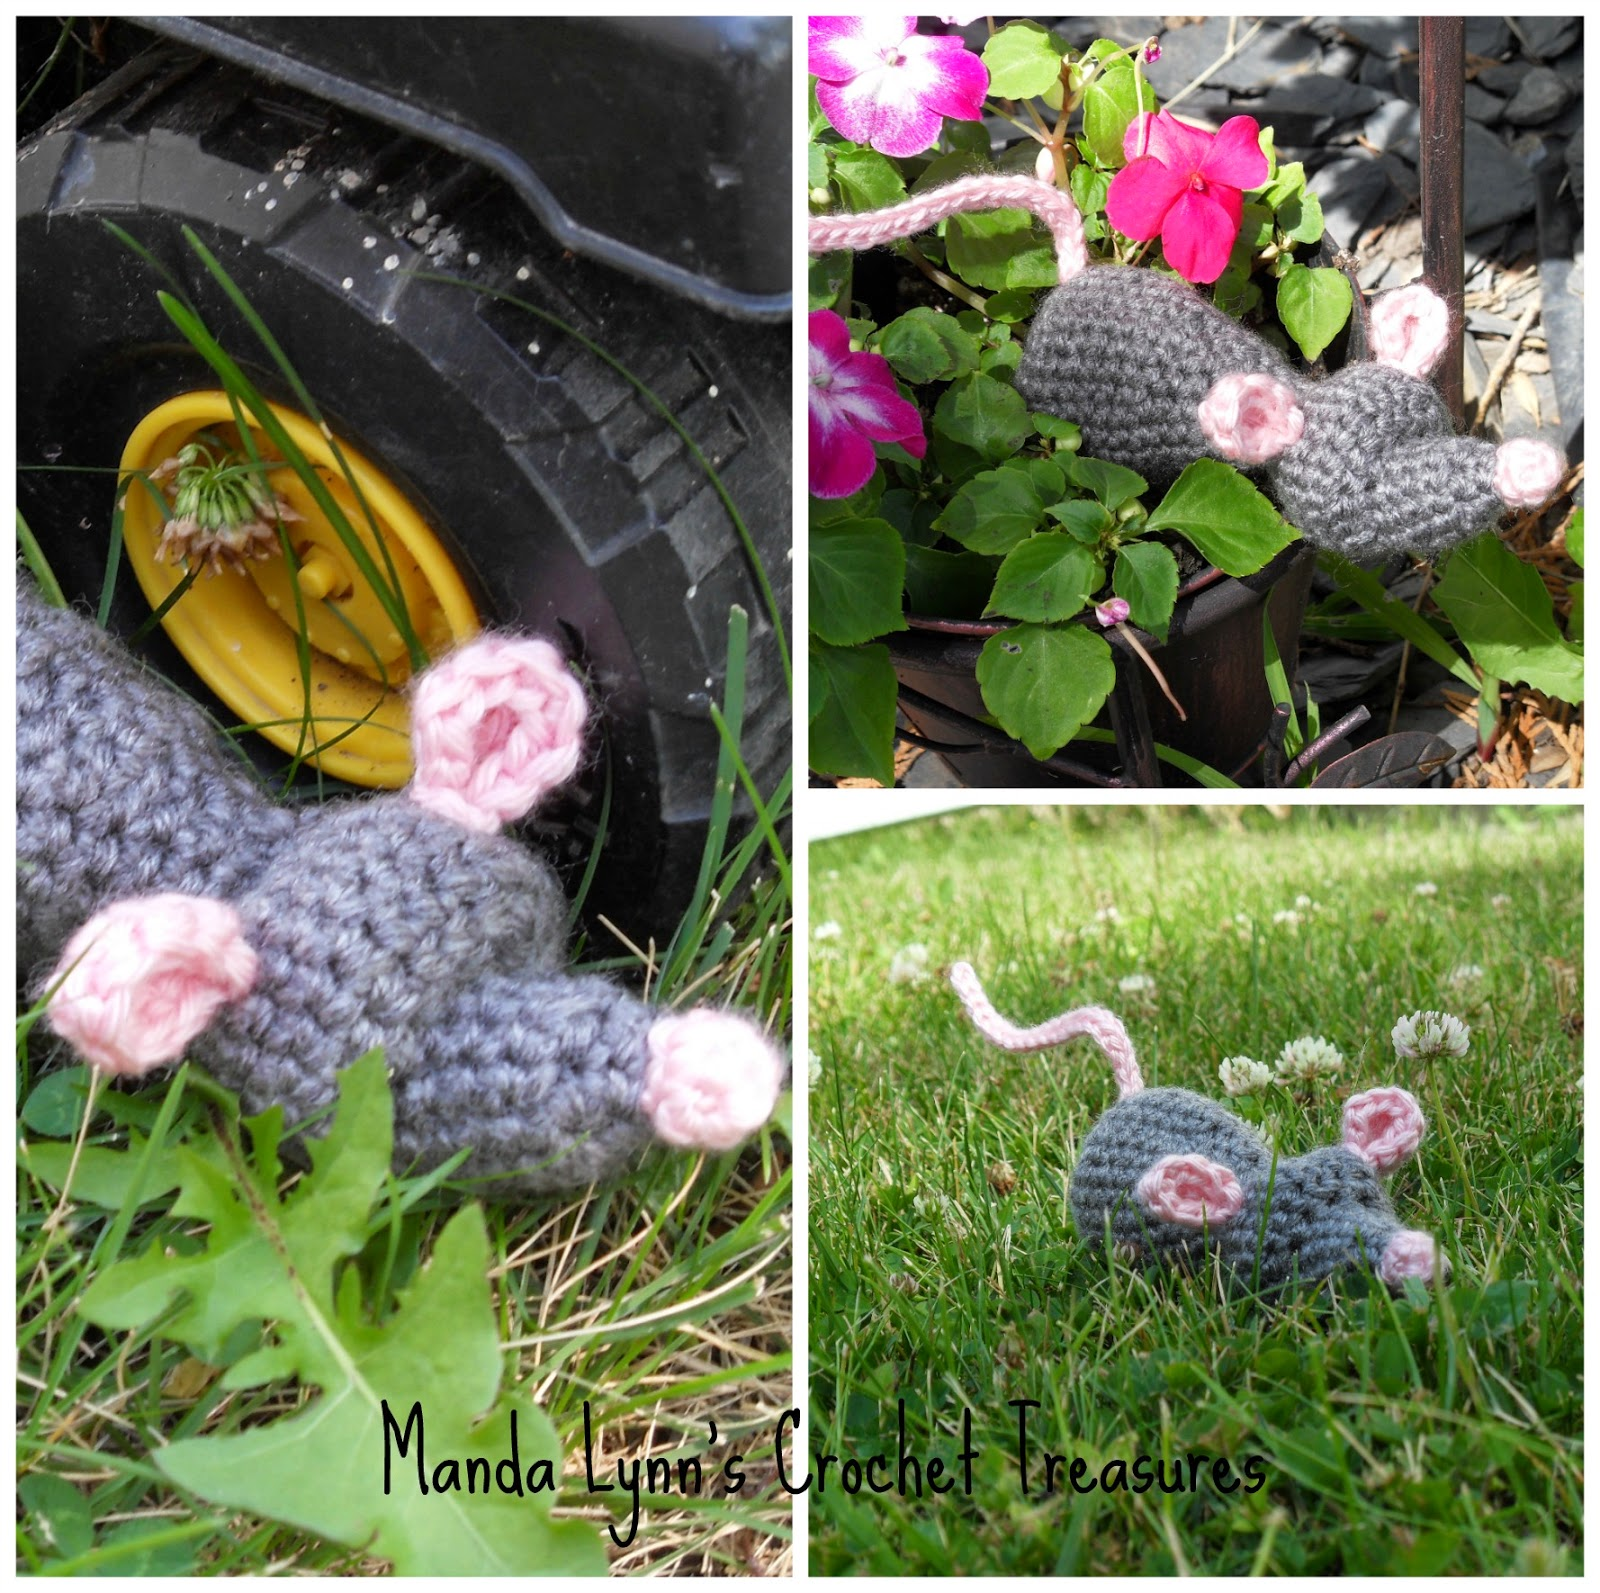 Mouse Plush or Refillable Cat Nip Toy ~ Manda Proell - MandaLynn's Crochet Treasures